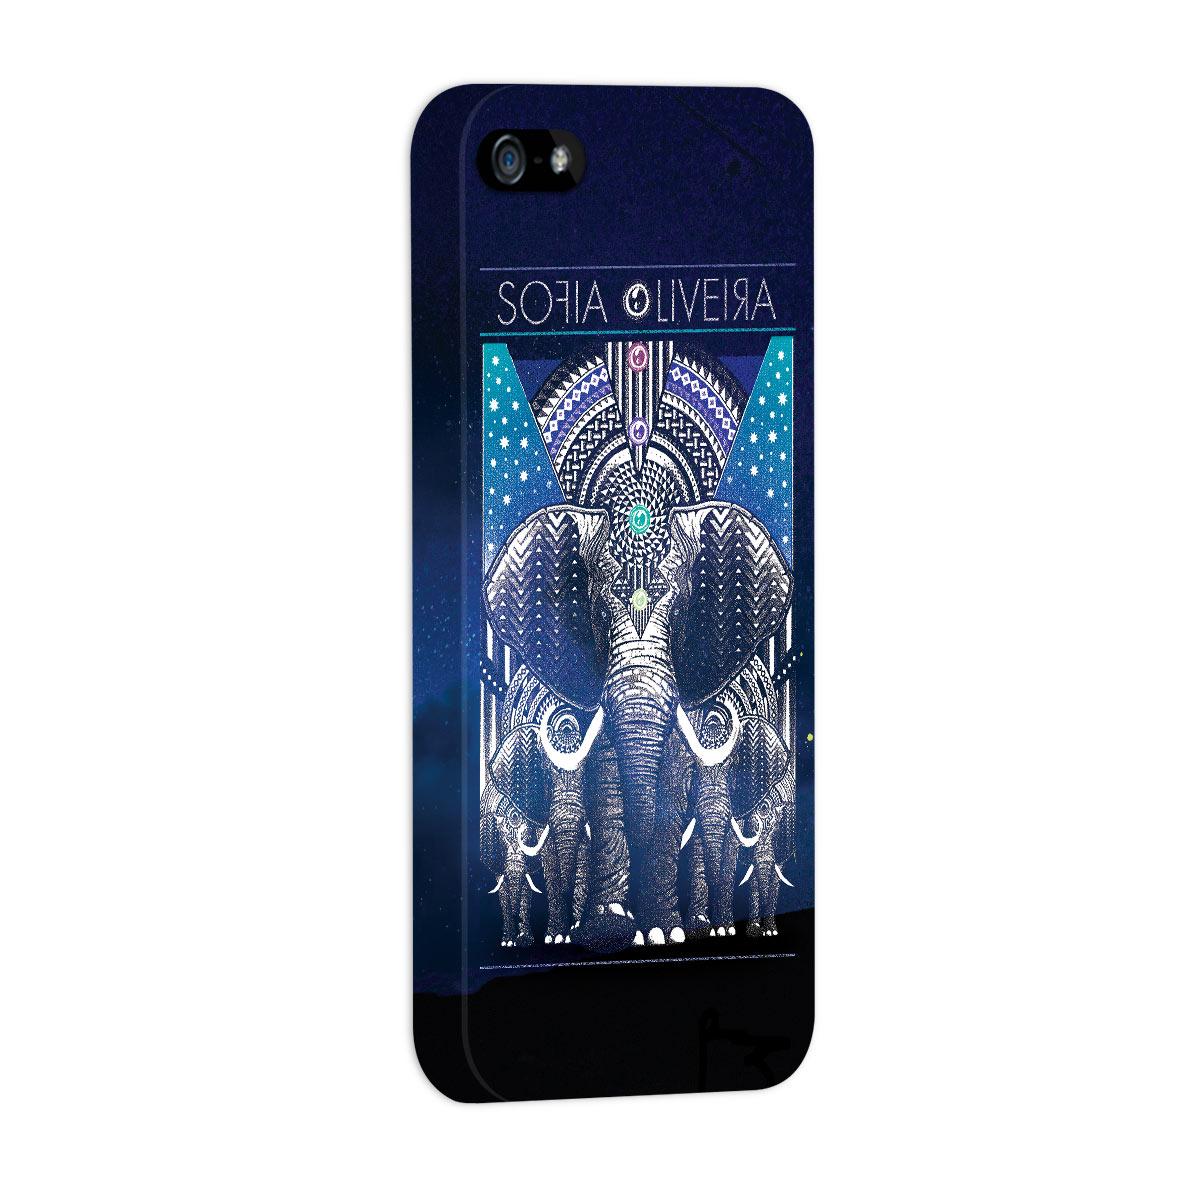 Capa para iPhone 5/5S Sofia Oliveira Elephant